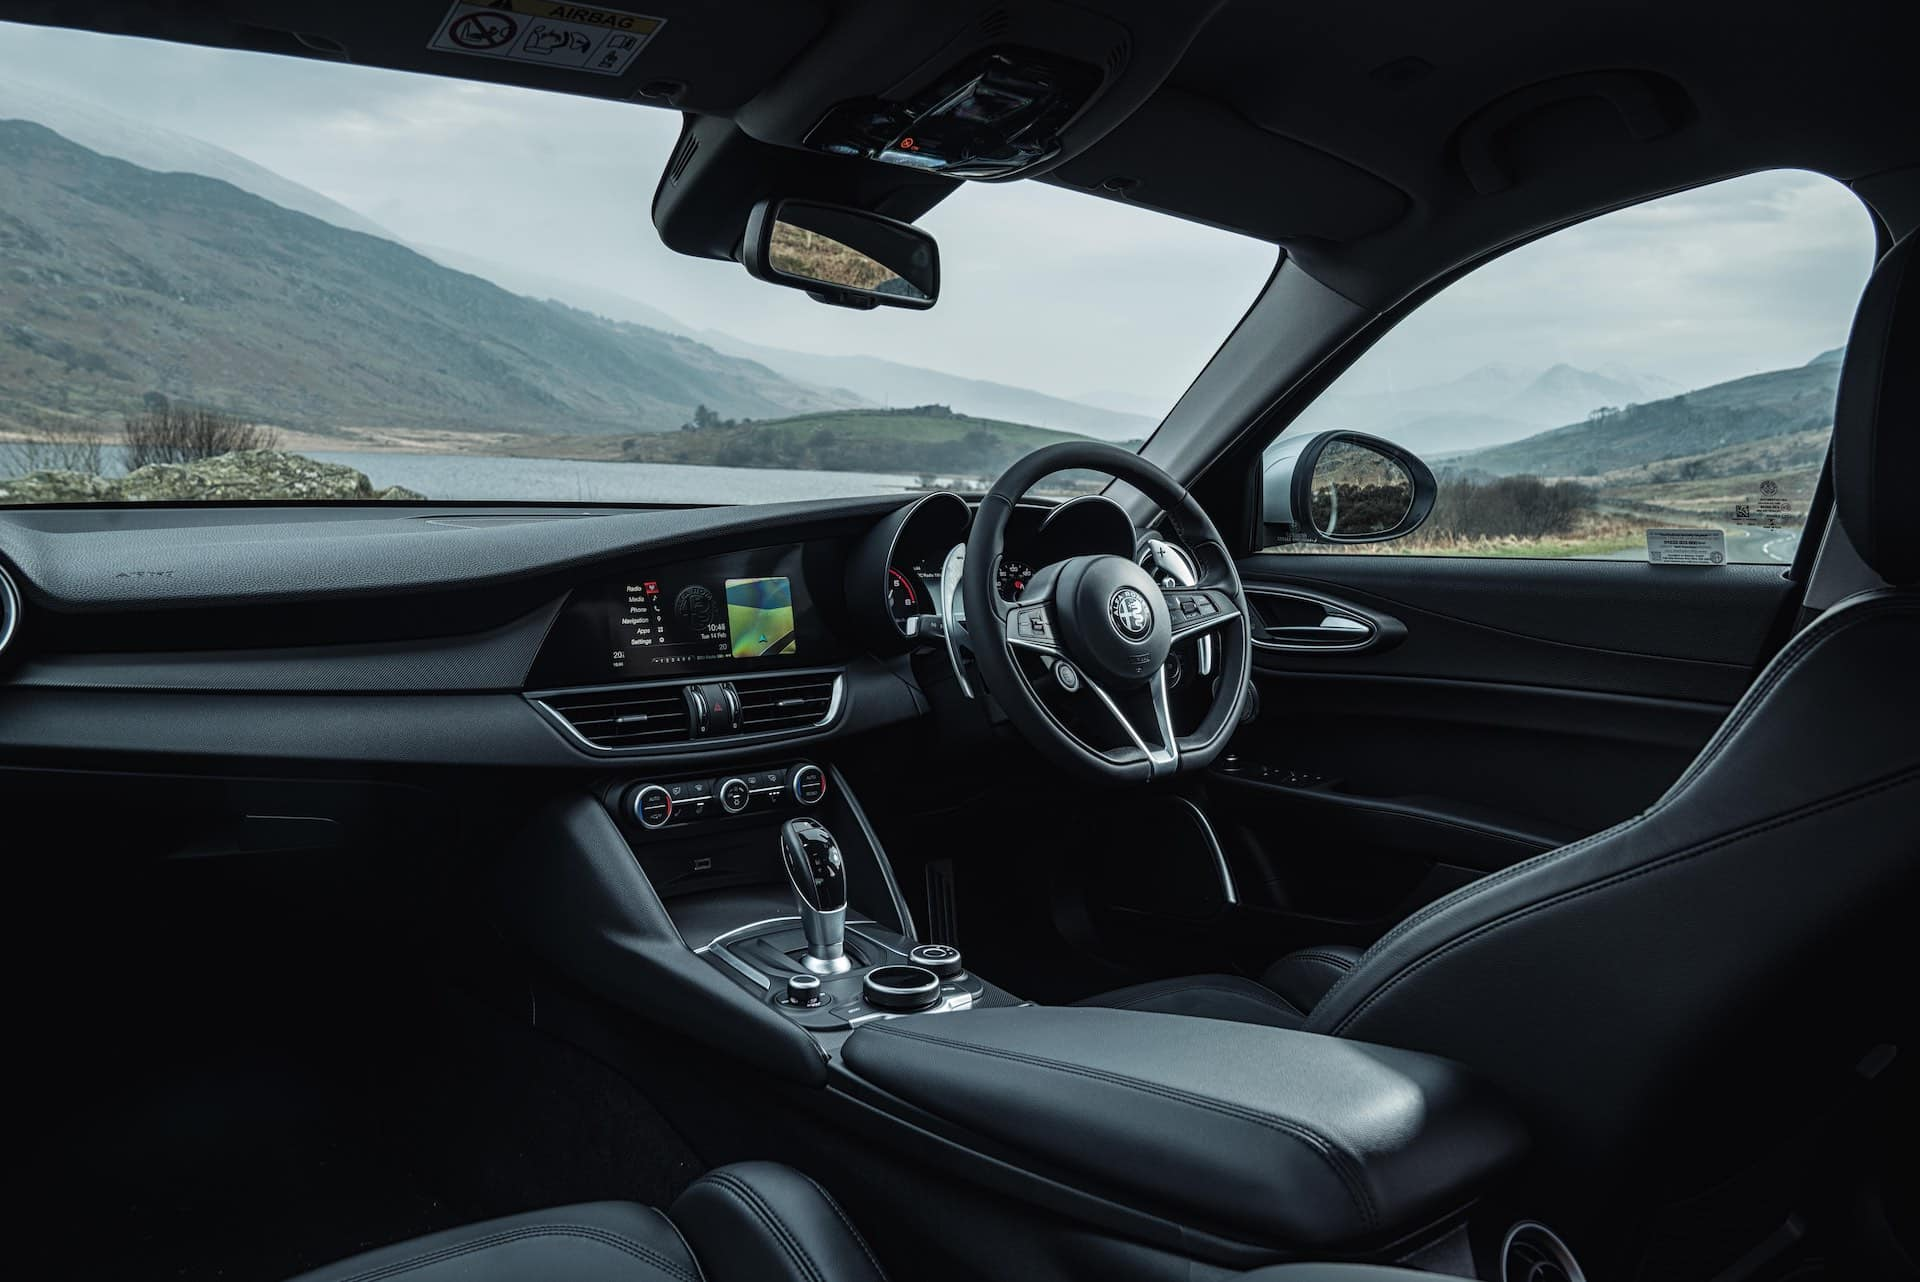 Alfa Romeo Giulia dashboard (The Car Expert 2018)